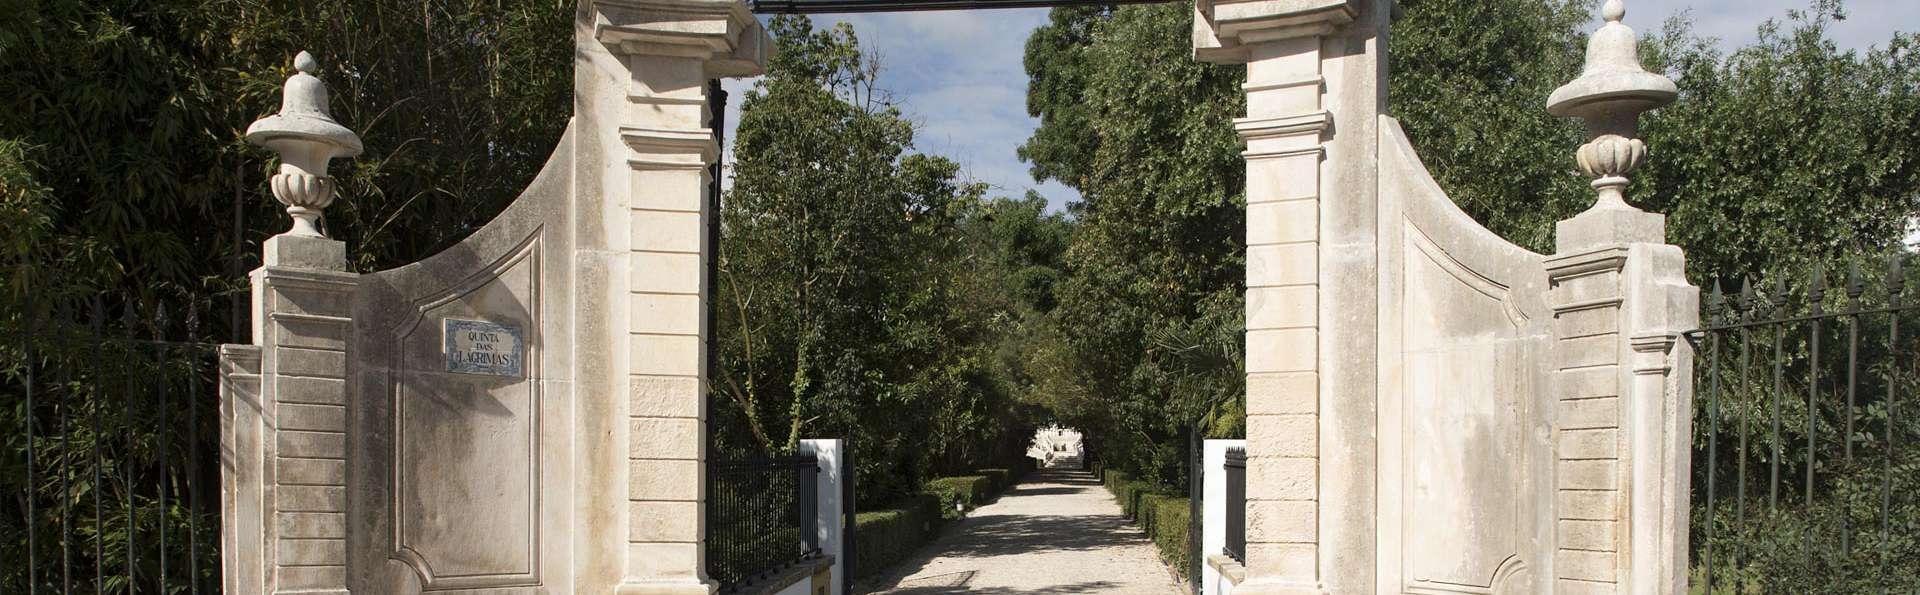 Quinta das Lágrimas Palace  - EDIT_FRONT_03.jpg